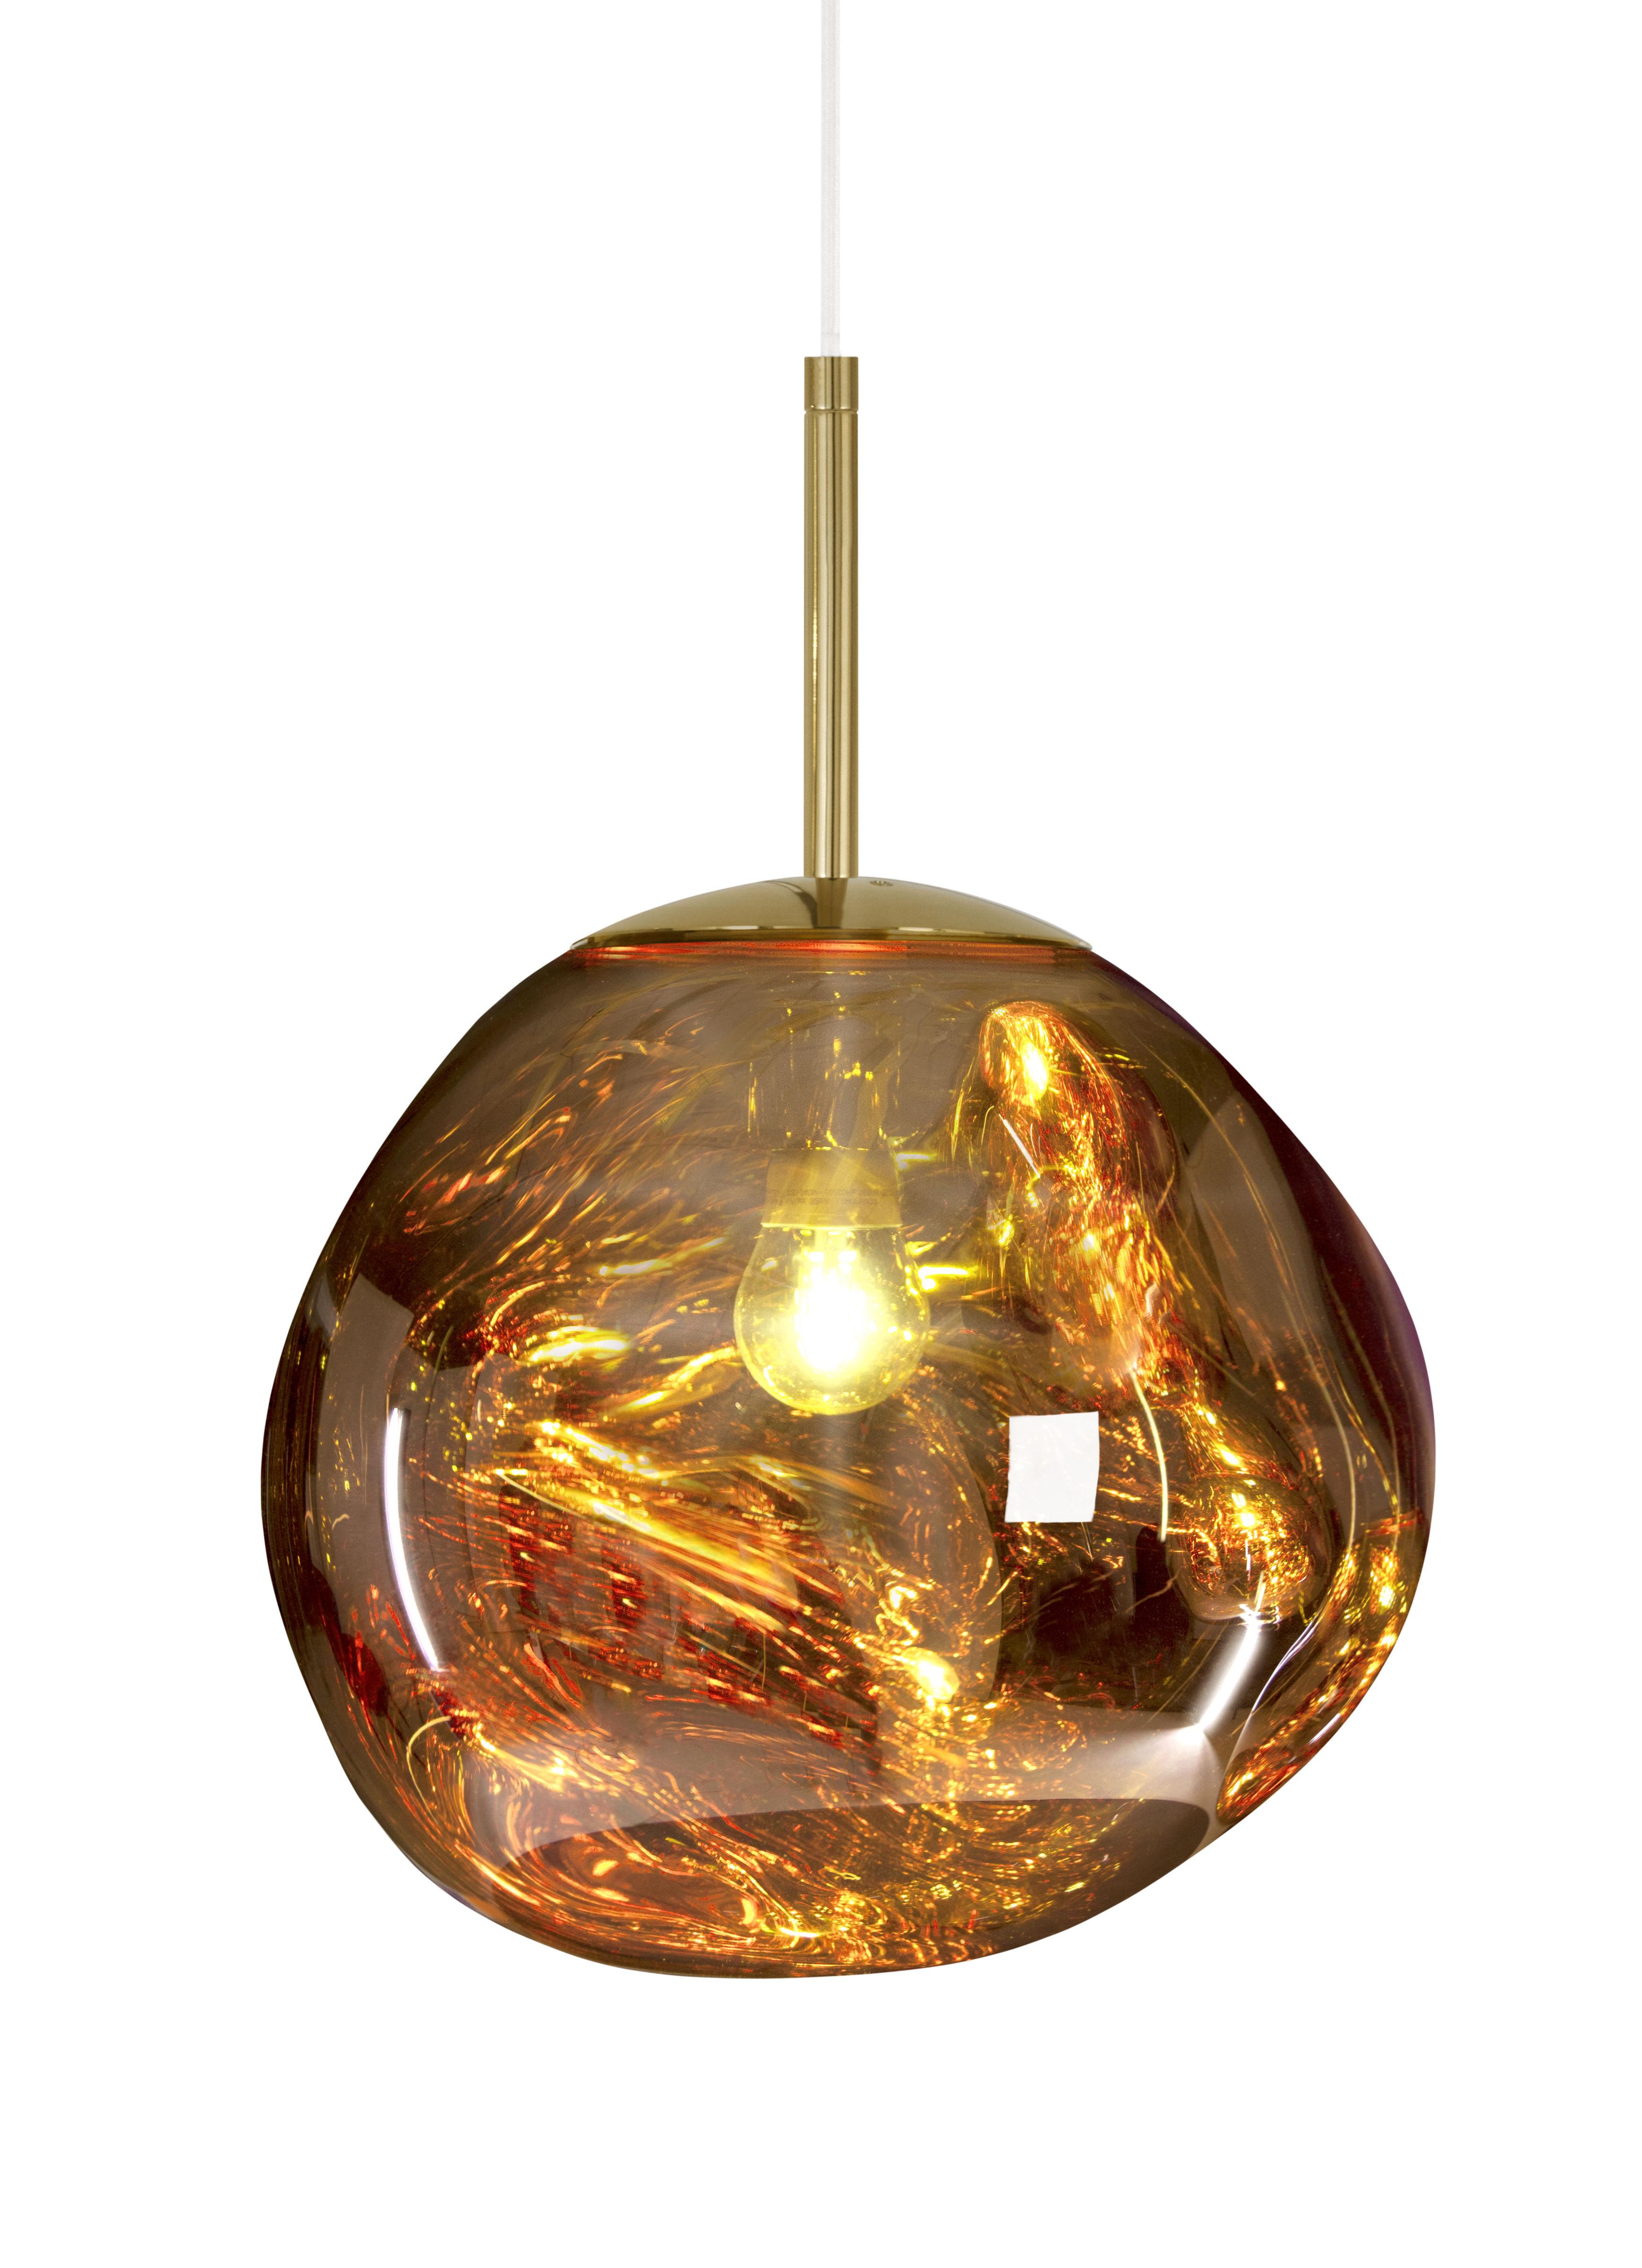 Lighting - Pendant Lighting - Melt Mini Pendant - Ø 27 cm by Tom Dixon - Gold - Polycarbonate